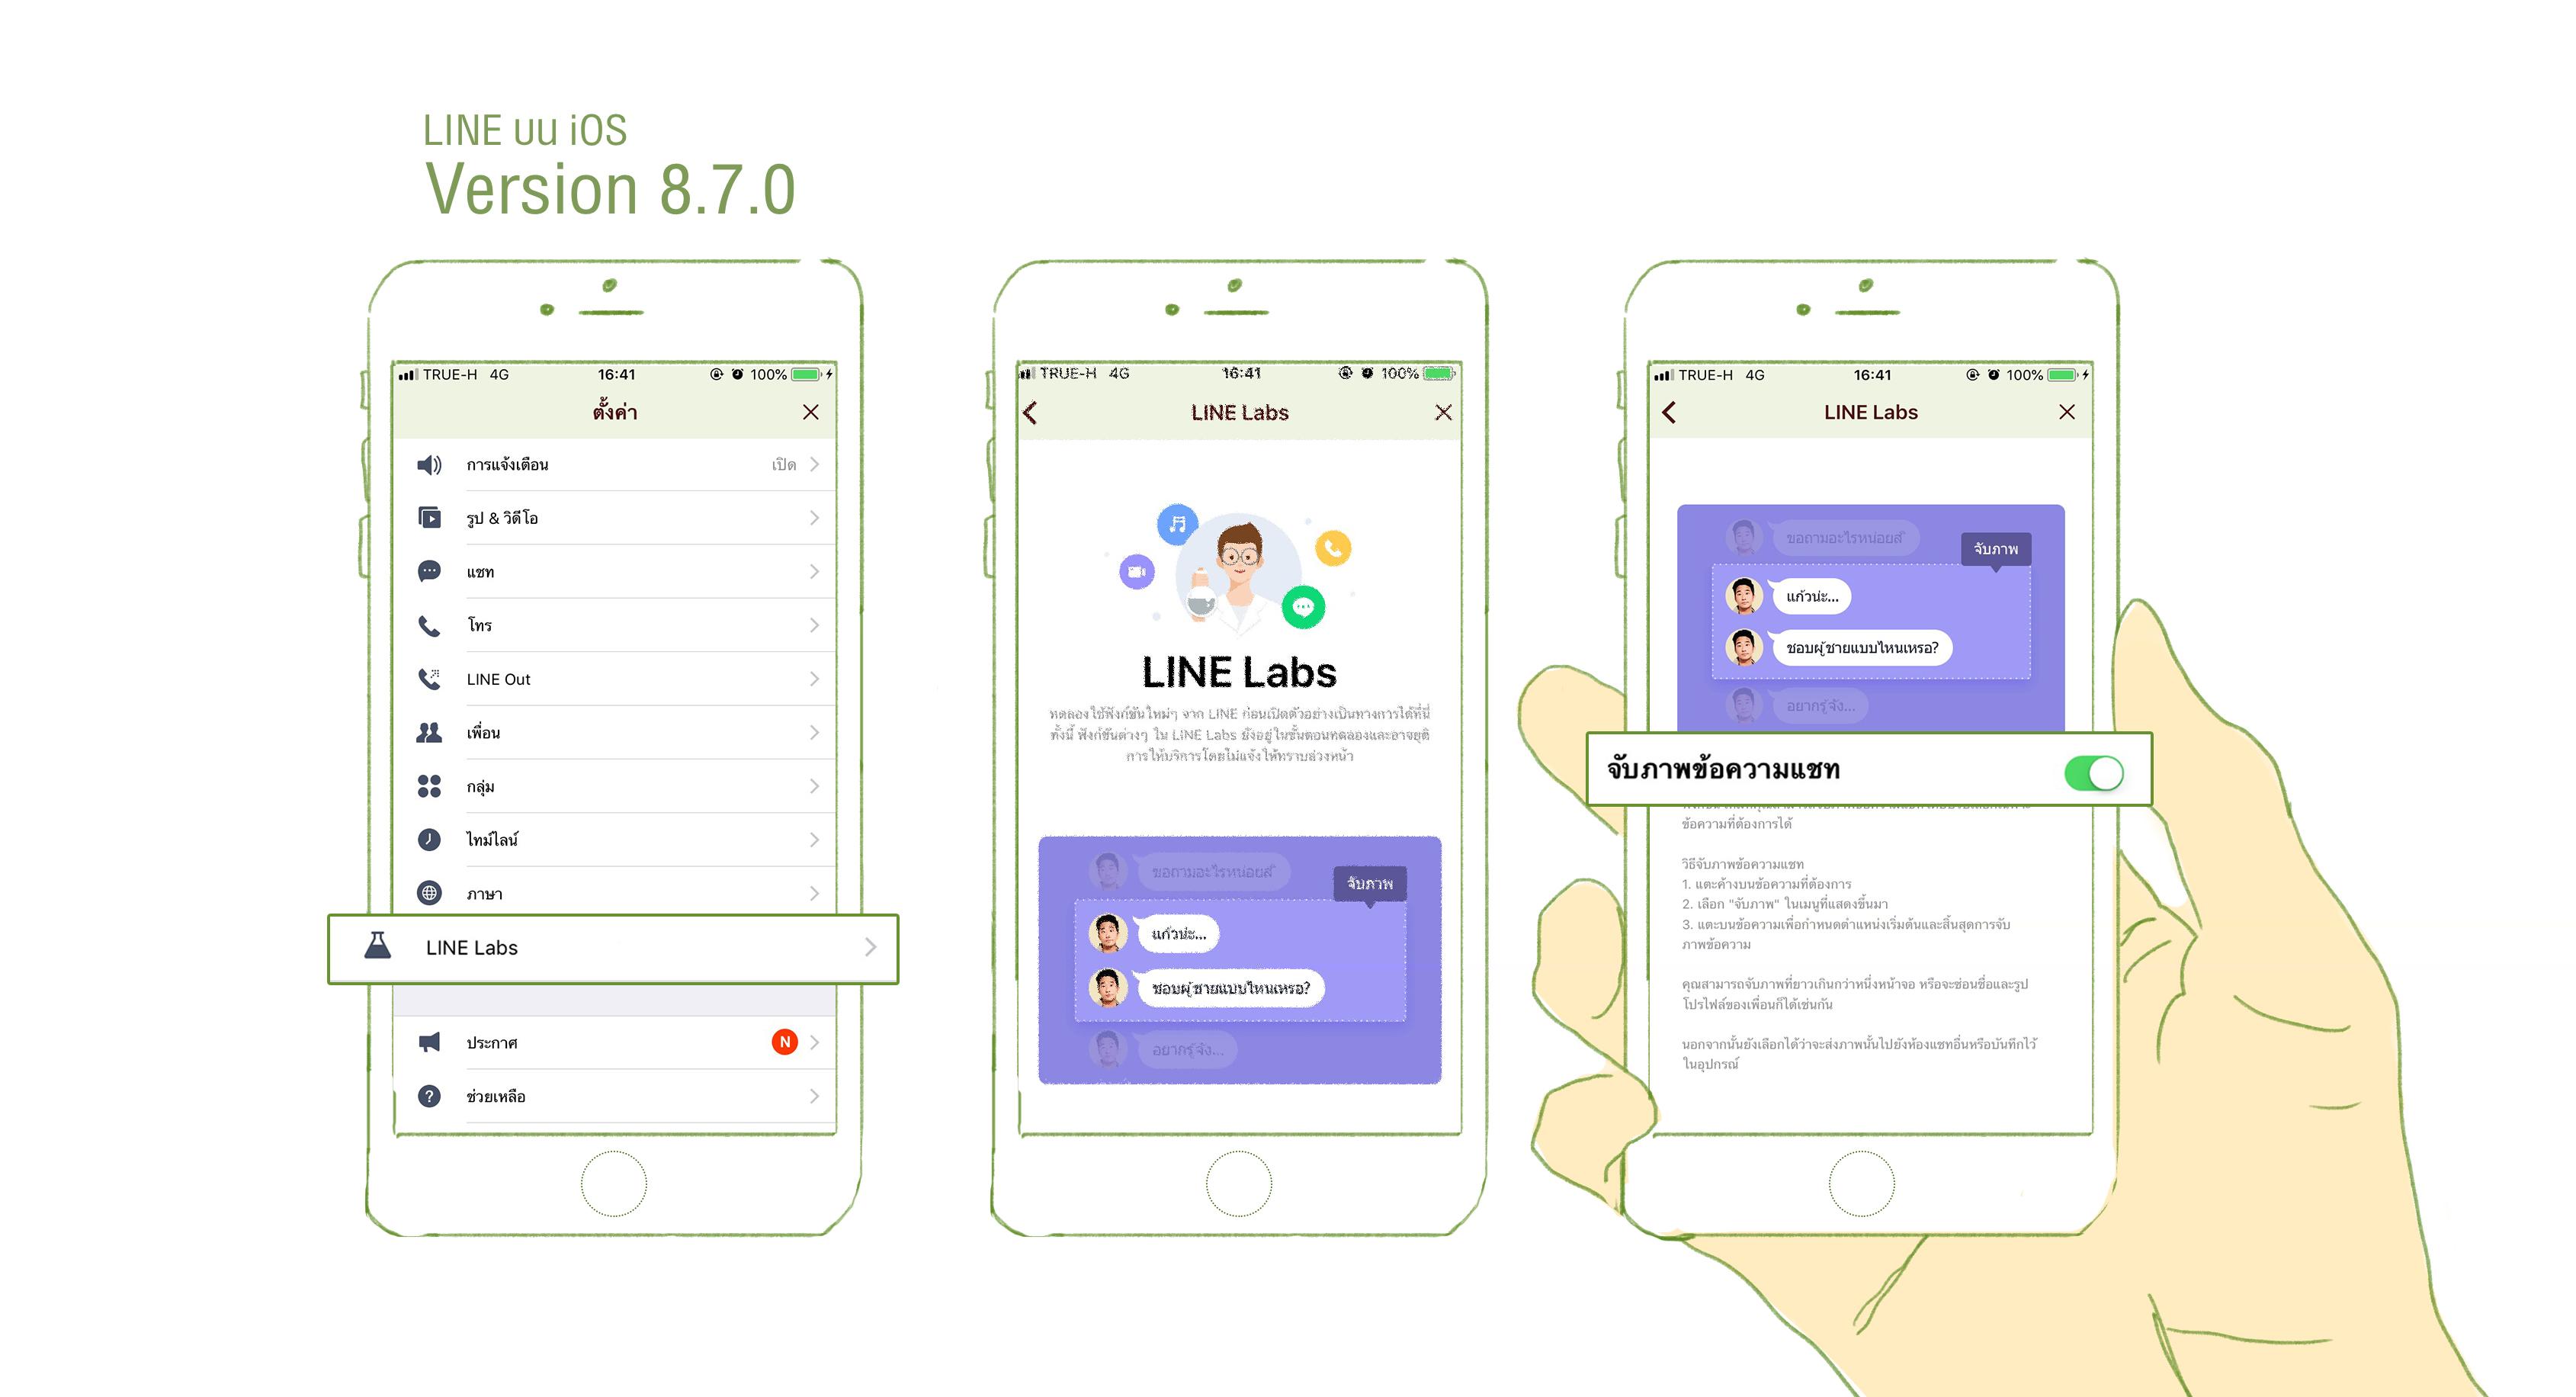 LineLabs จะเข้าไปใช้ LINE Labs ต้องทำยังไง Line ออก Feature ใหม่ LINE Labs รู้จักกันหรือยังว่าคืออะไร